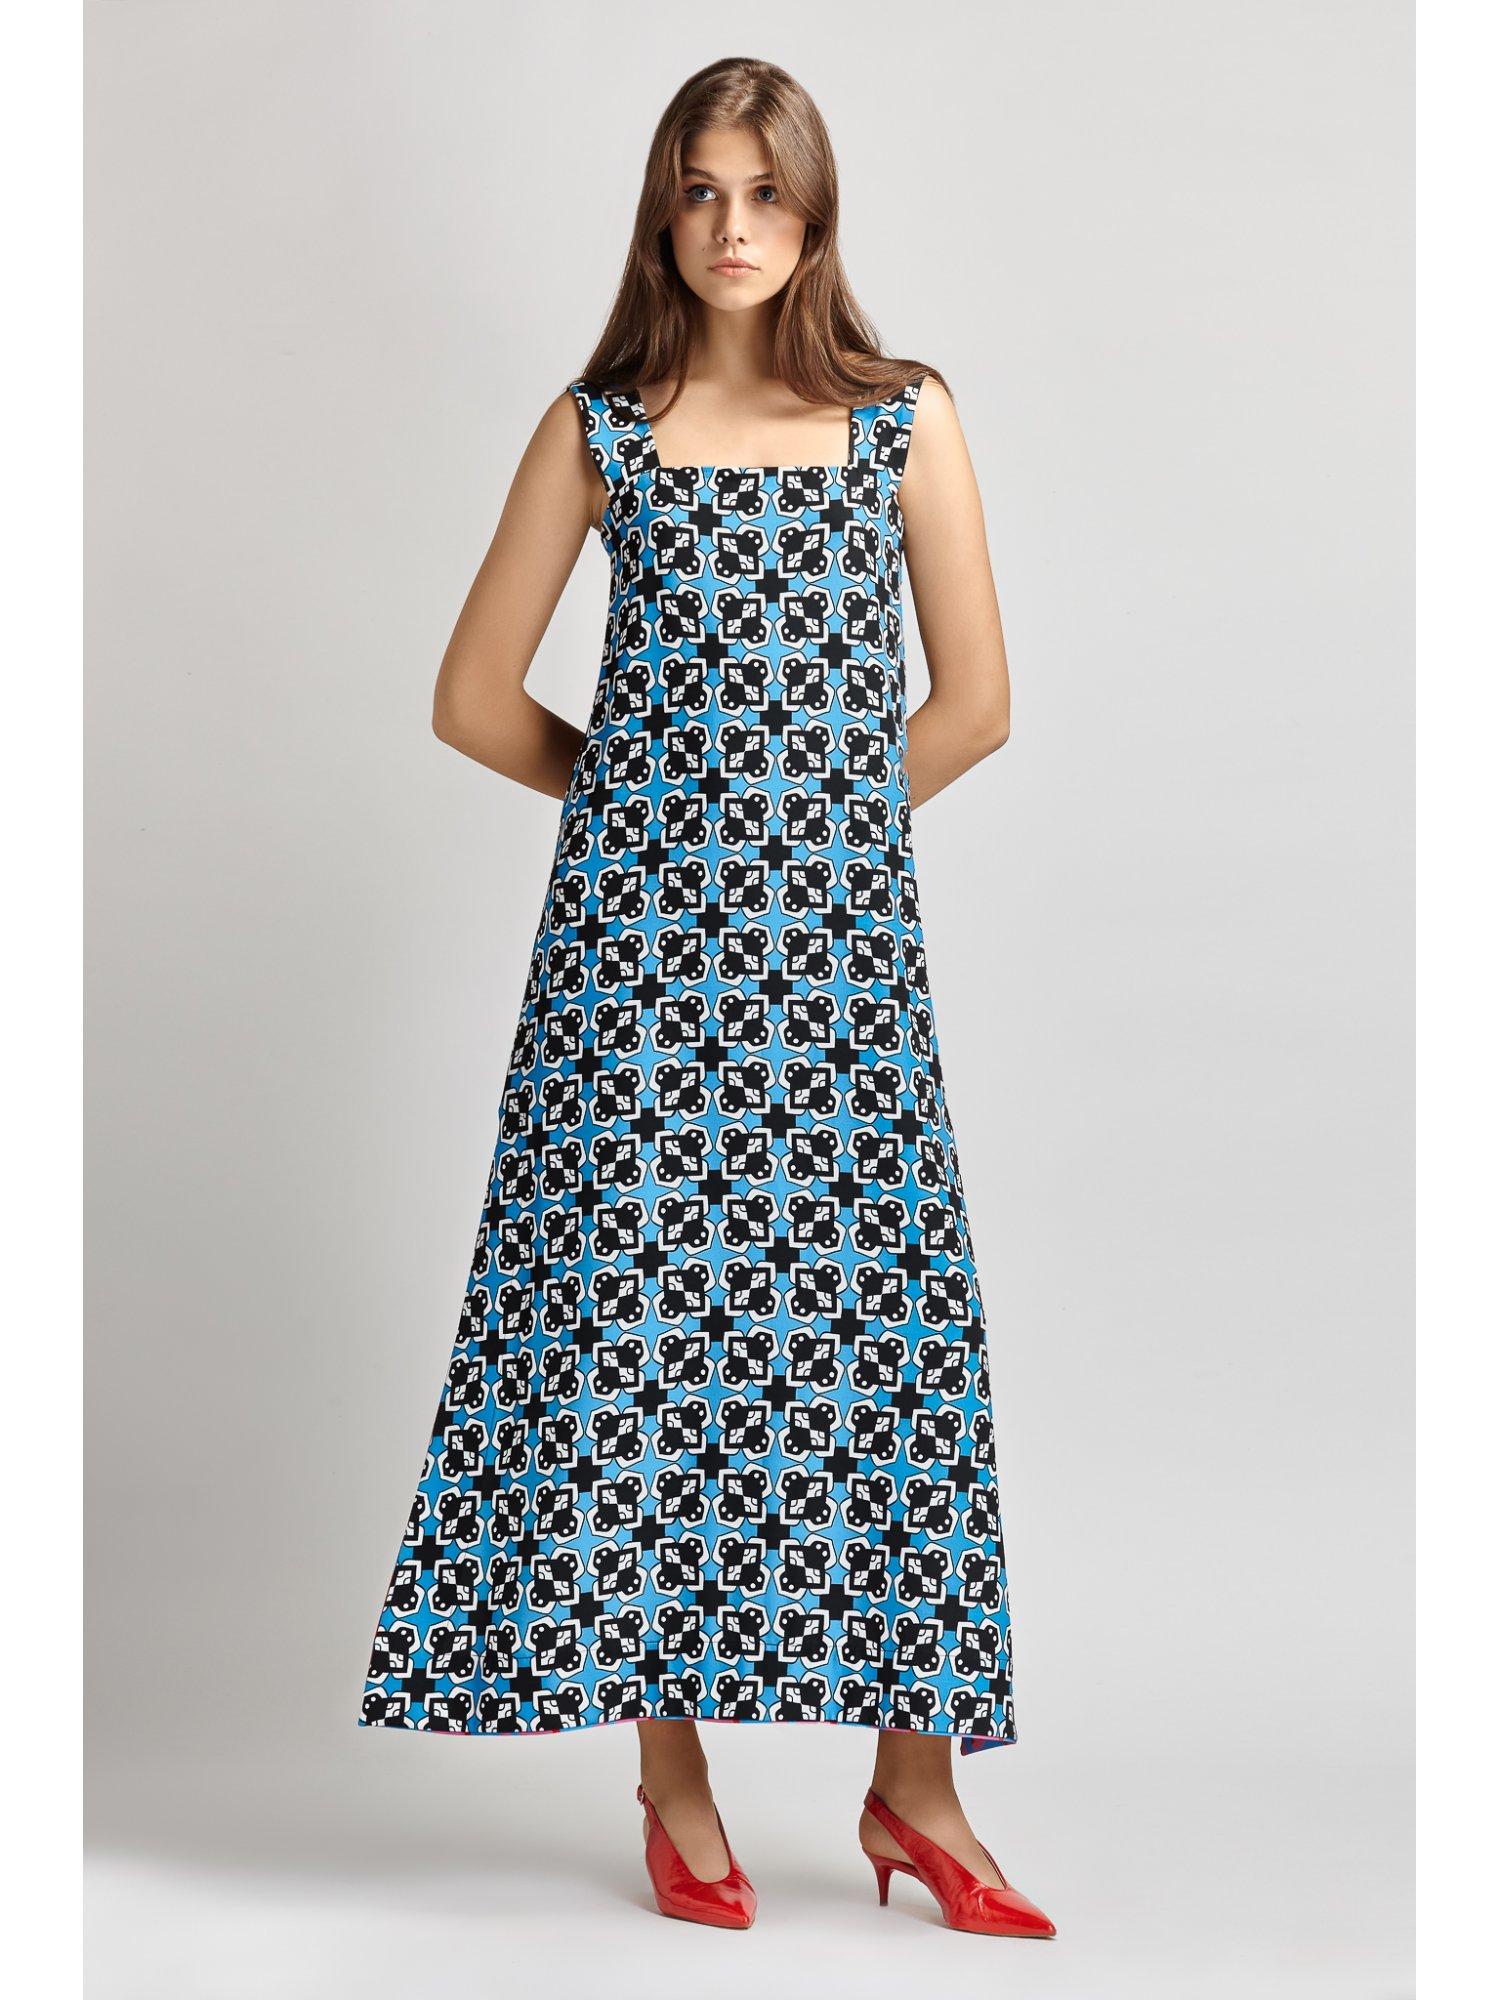 Tithorea dress